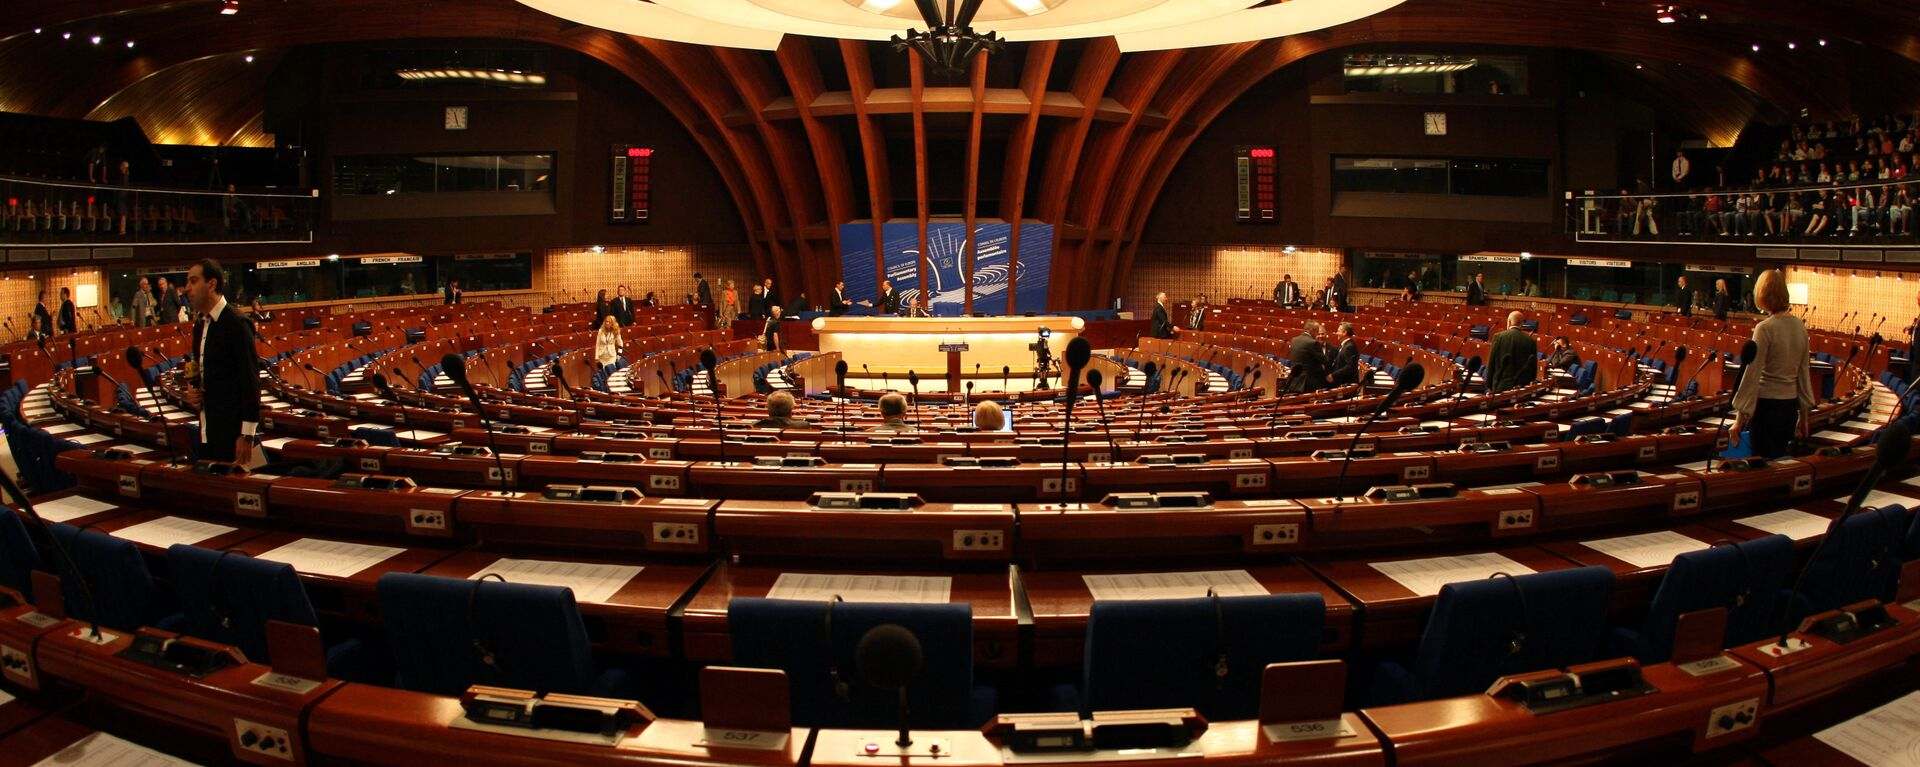 Asamblea Parlamentaria del Consejo de Europa (PACE) en Estrasburgo - Sputnik Mundo, 1920, 23.09.2021